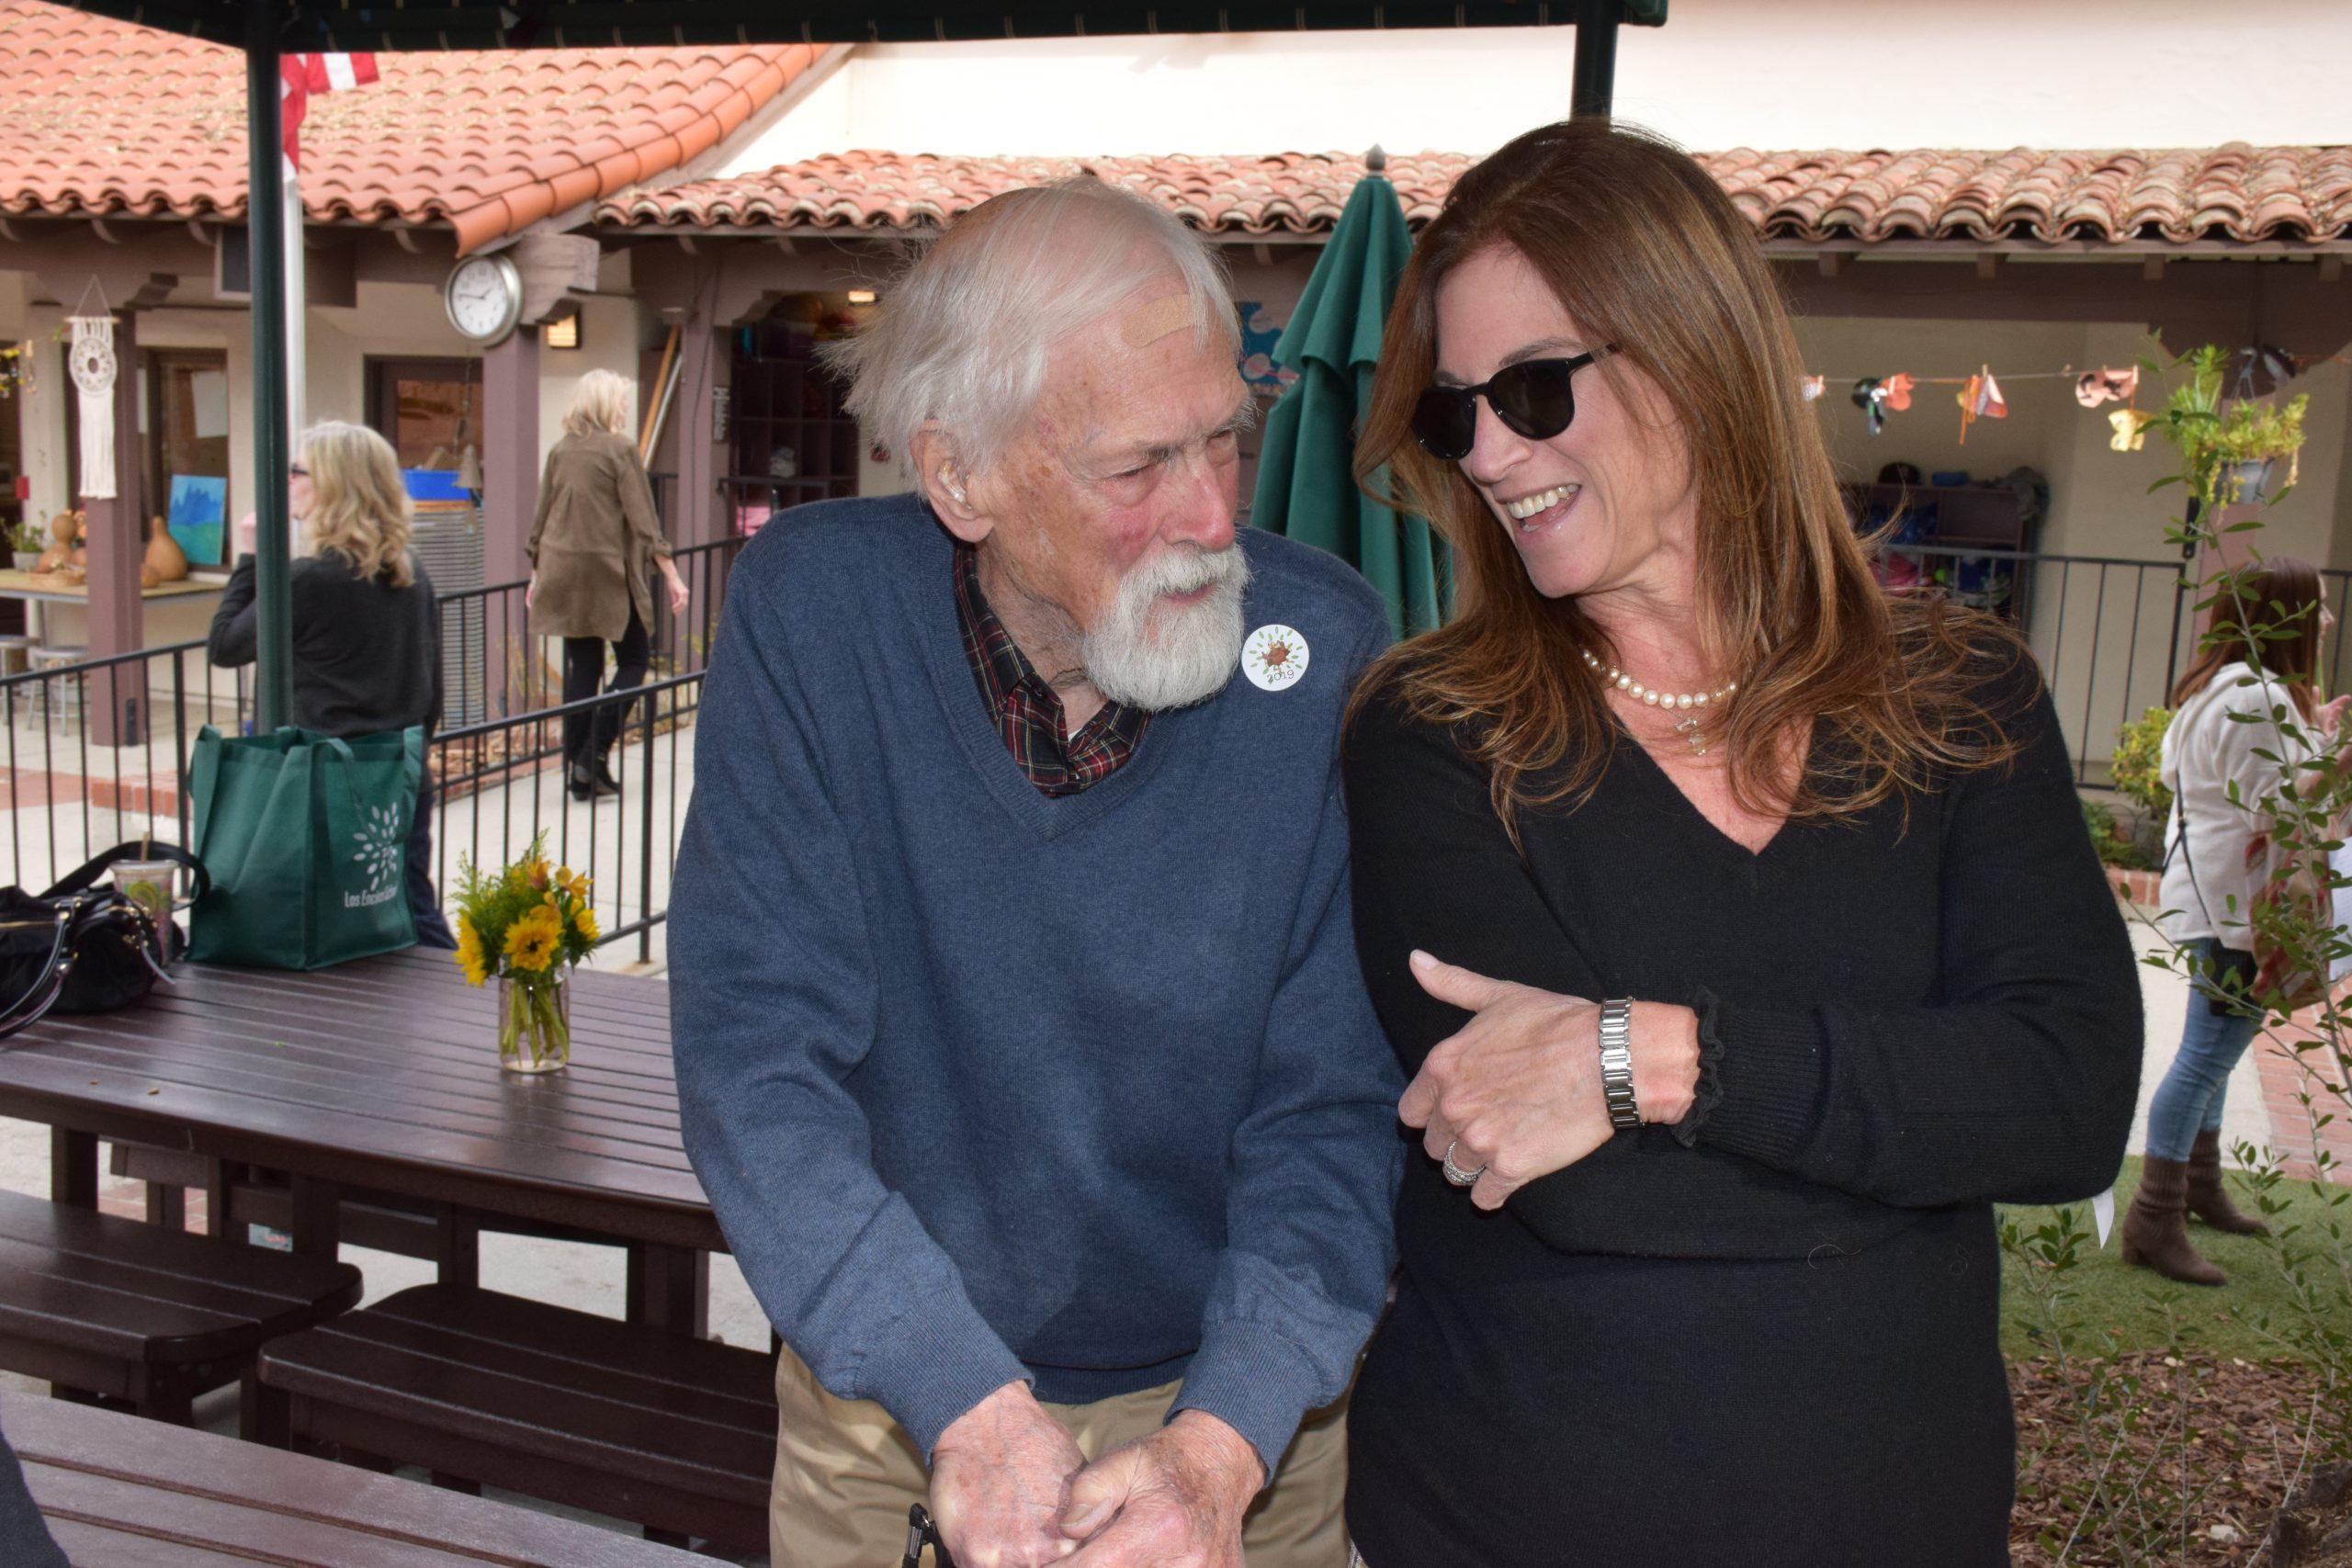 Photo: Chris Holabird and Ilene Reinfeld share a laugh on Thanksgiving.